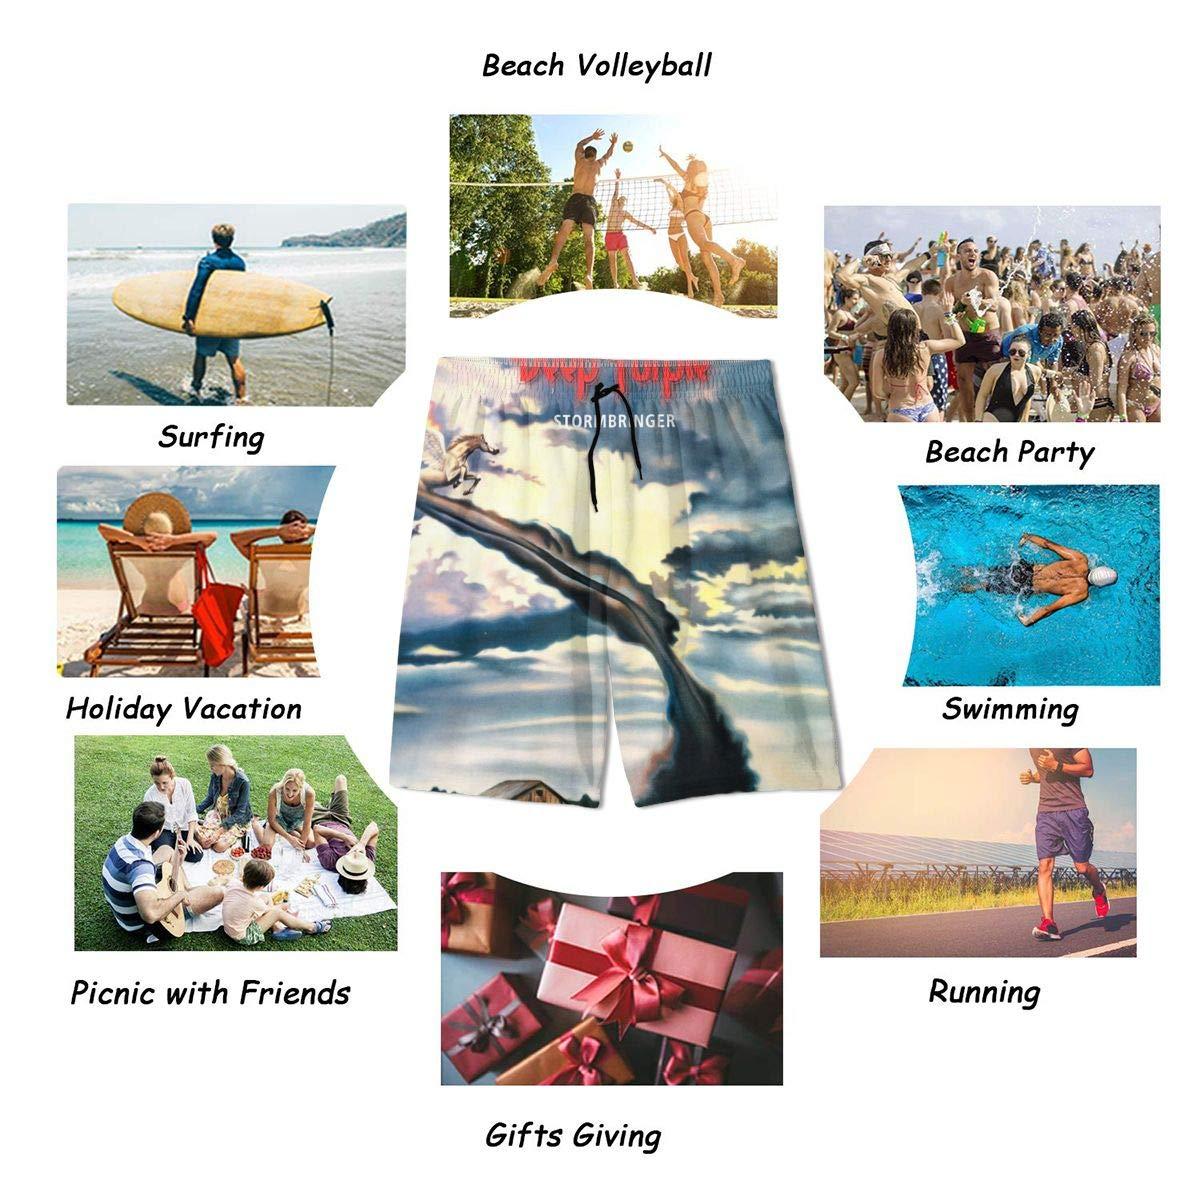 JacobKThompson Deep Purple Summer Adolescent Men Leisure Quick Dry Surfing Beach Shorts Elastic Band Pocket Drawstring